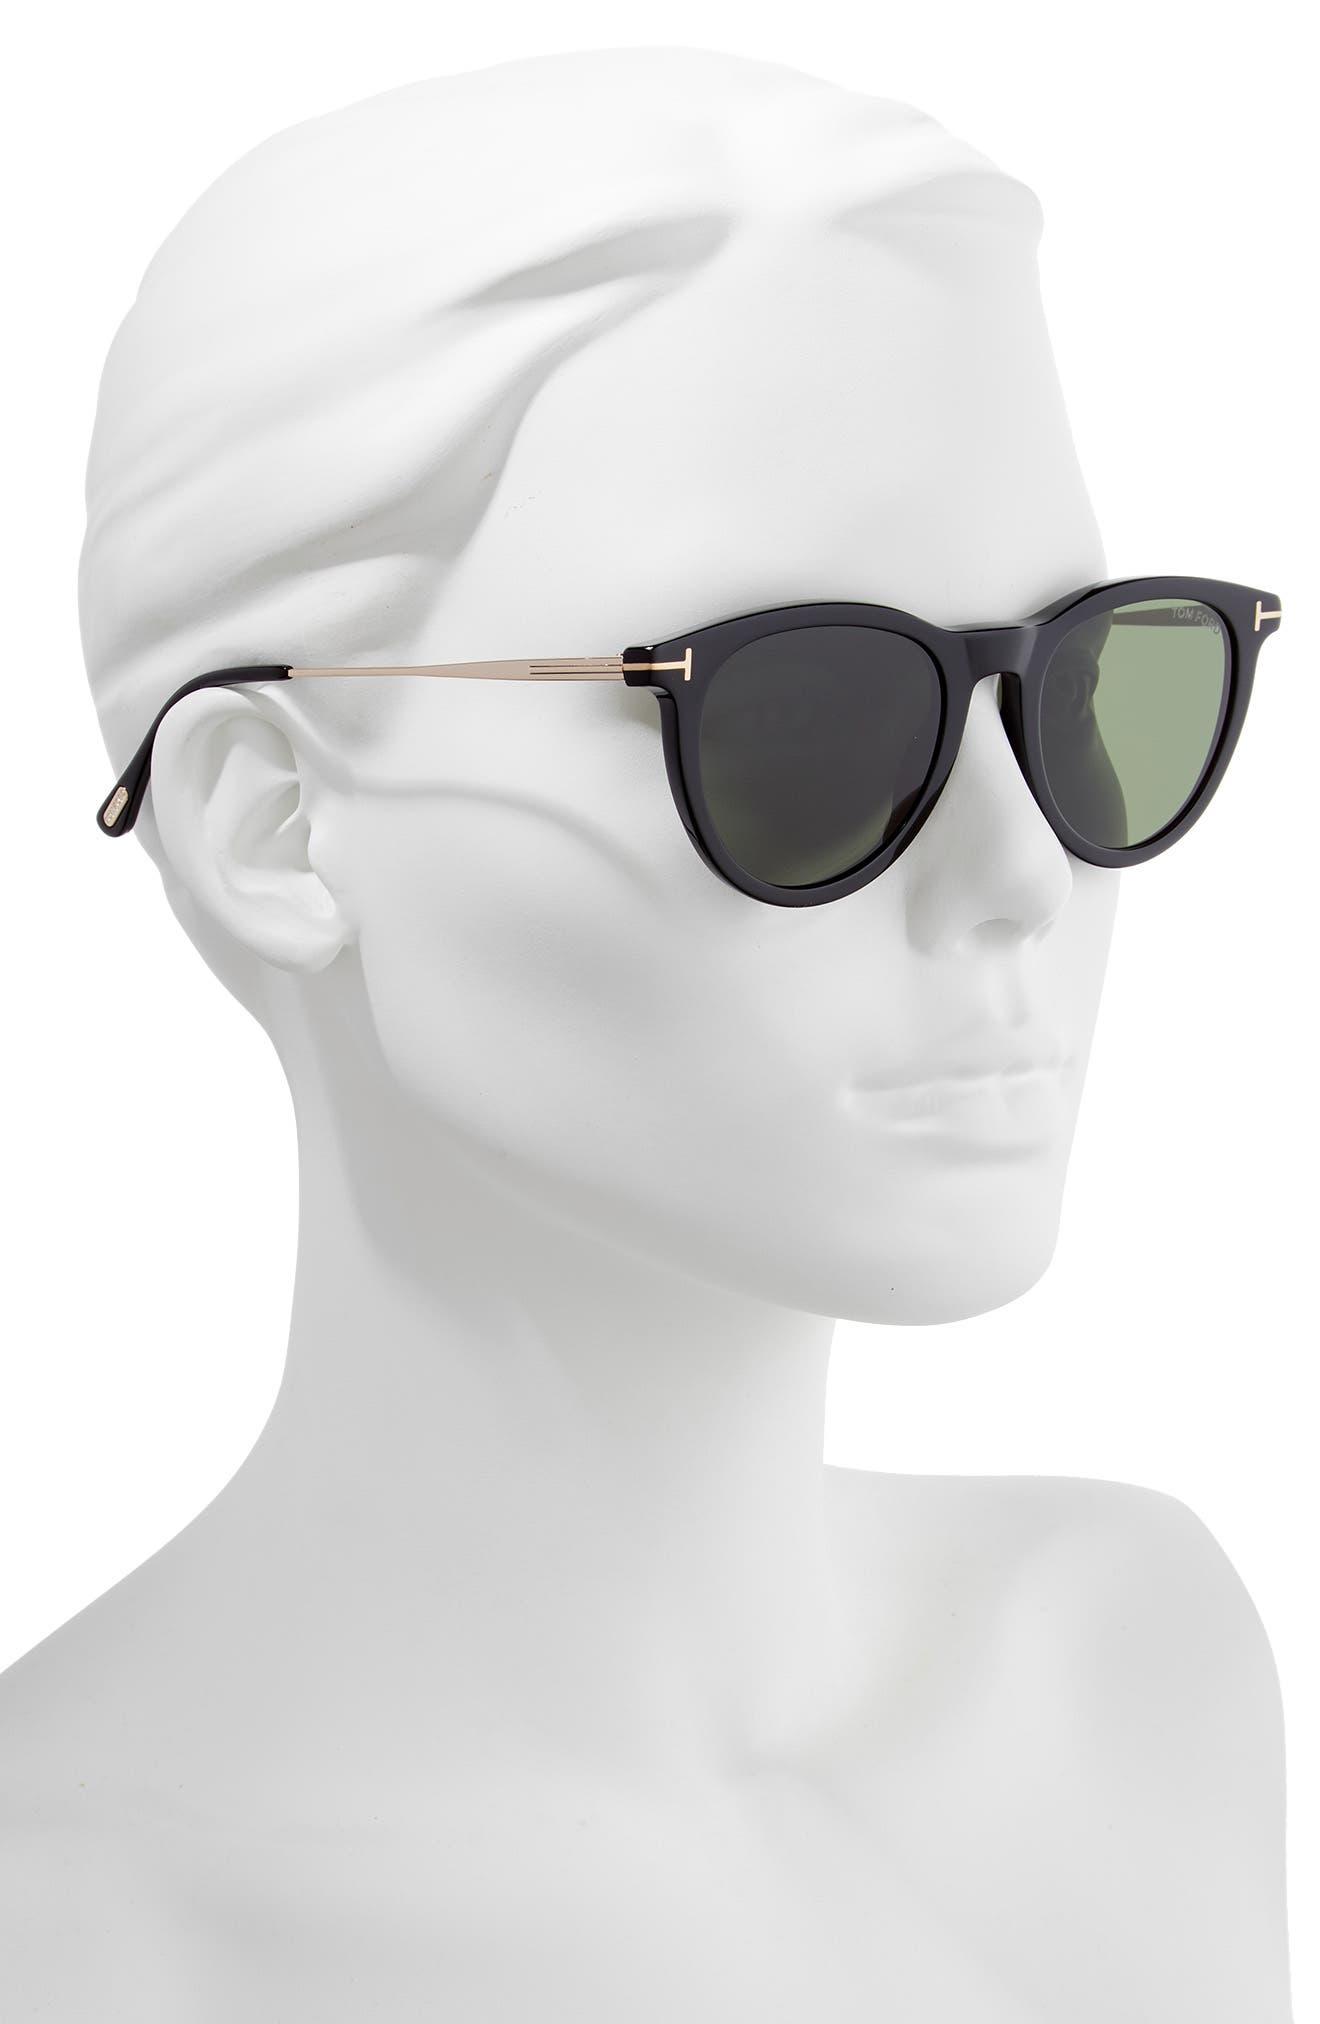 51mm Cat Eye Sunglasses,                             Alternate thumbnail 2, color,                             SHINY BLACK/ GREEN